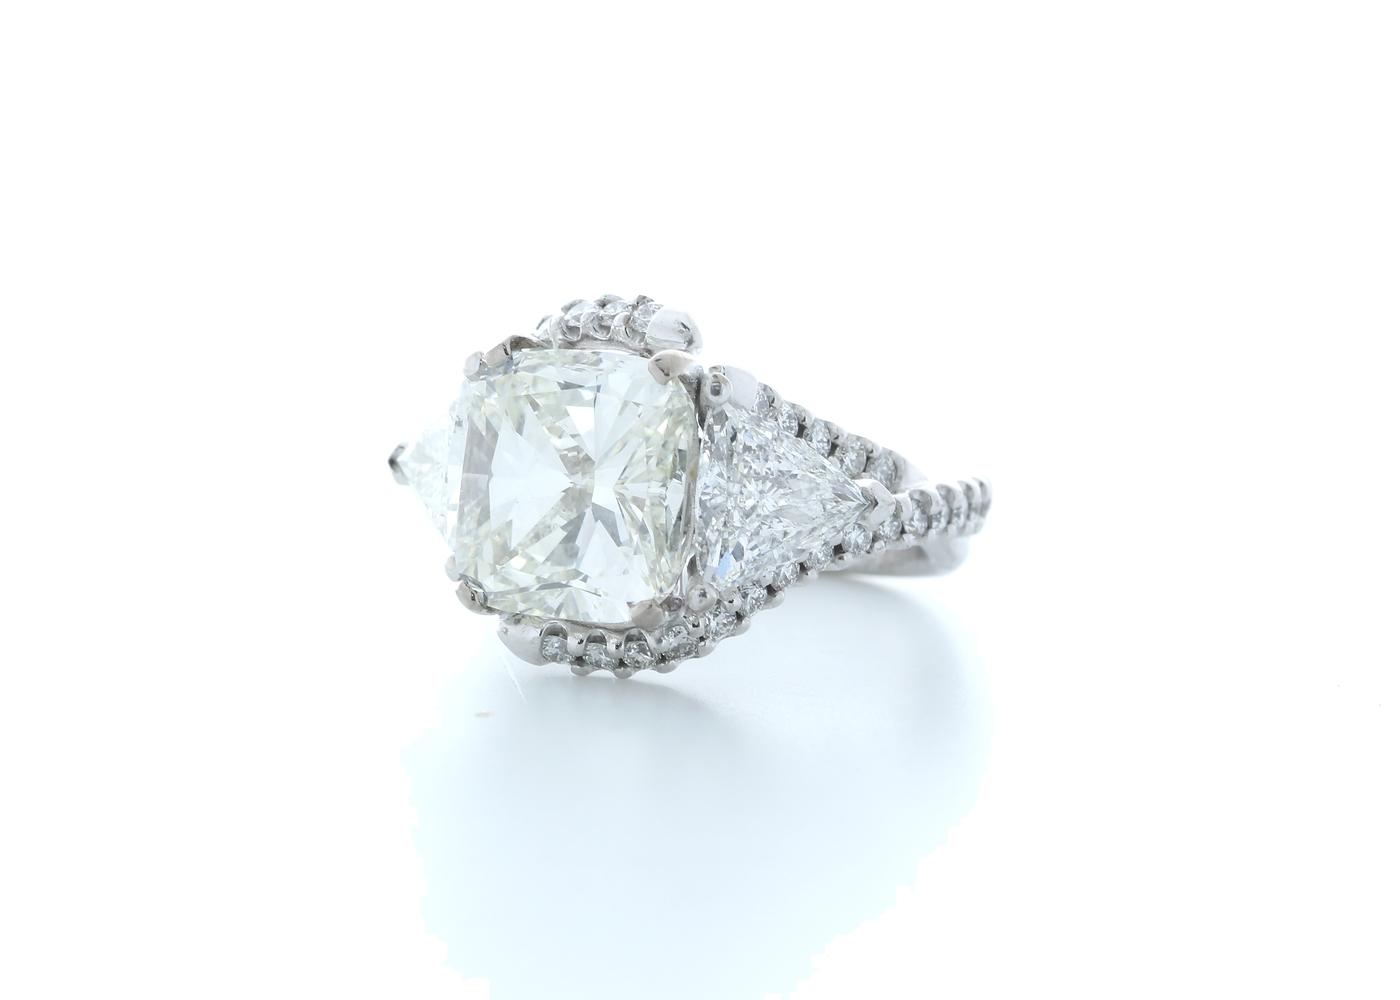 18ct White Gold Cushion Diamond Ring 7.03 (4.51) Carats - Image 2 of 5